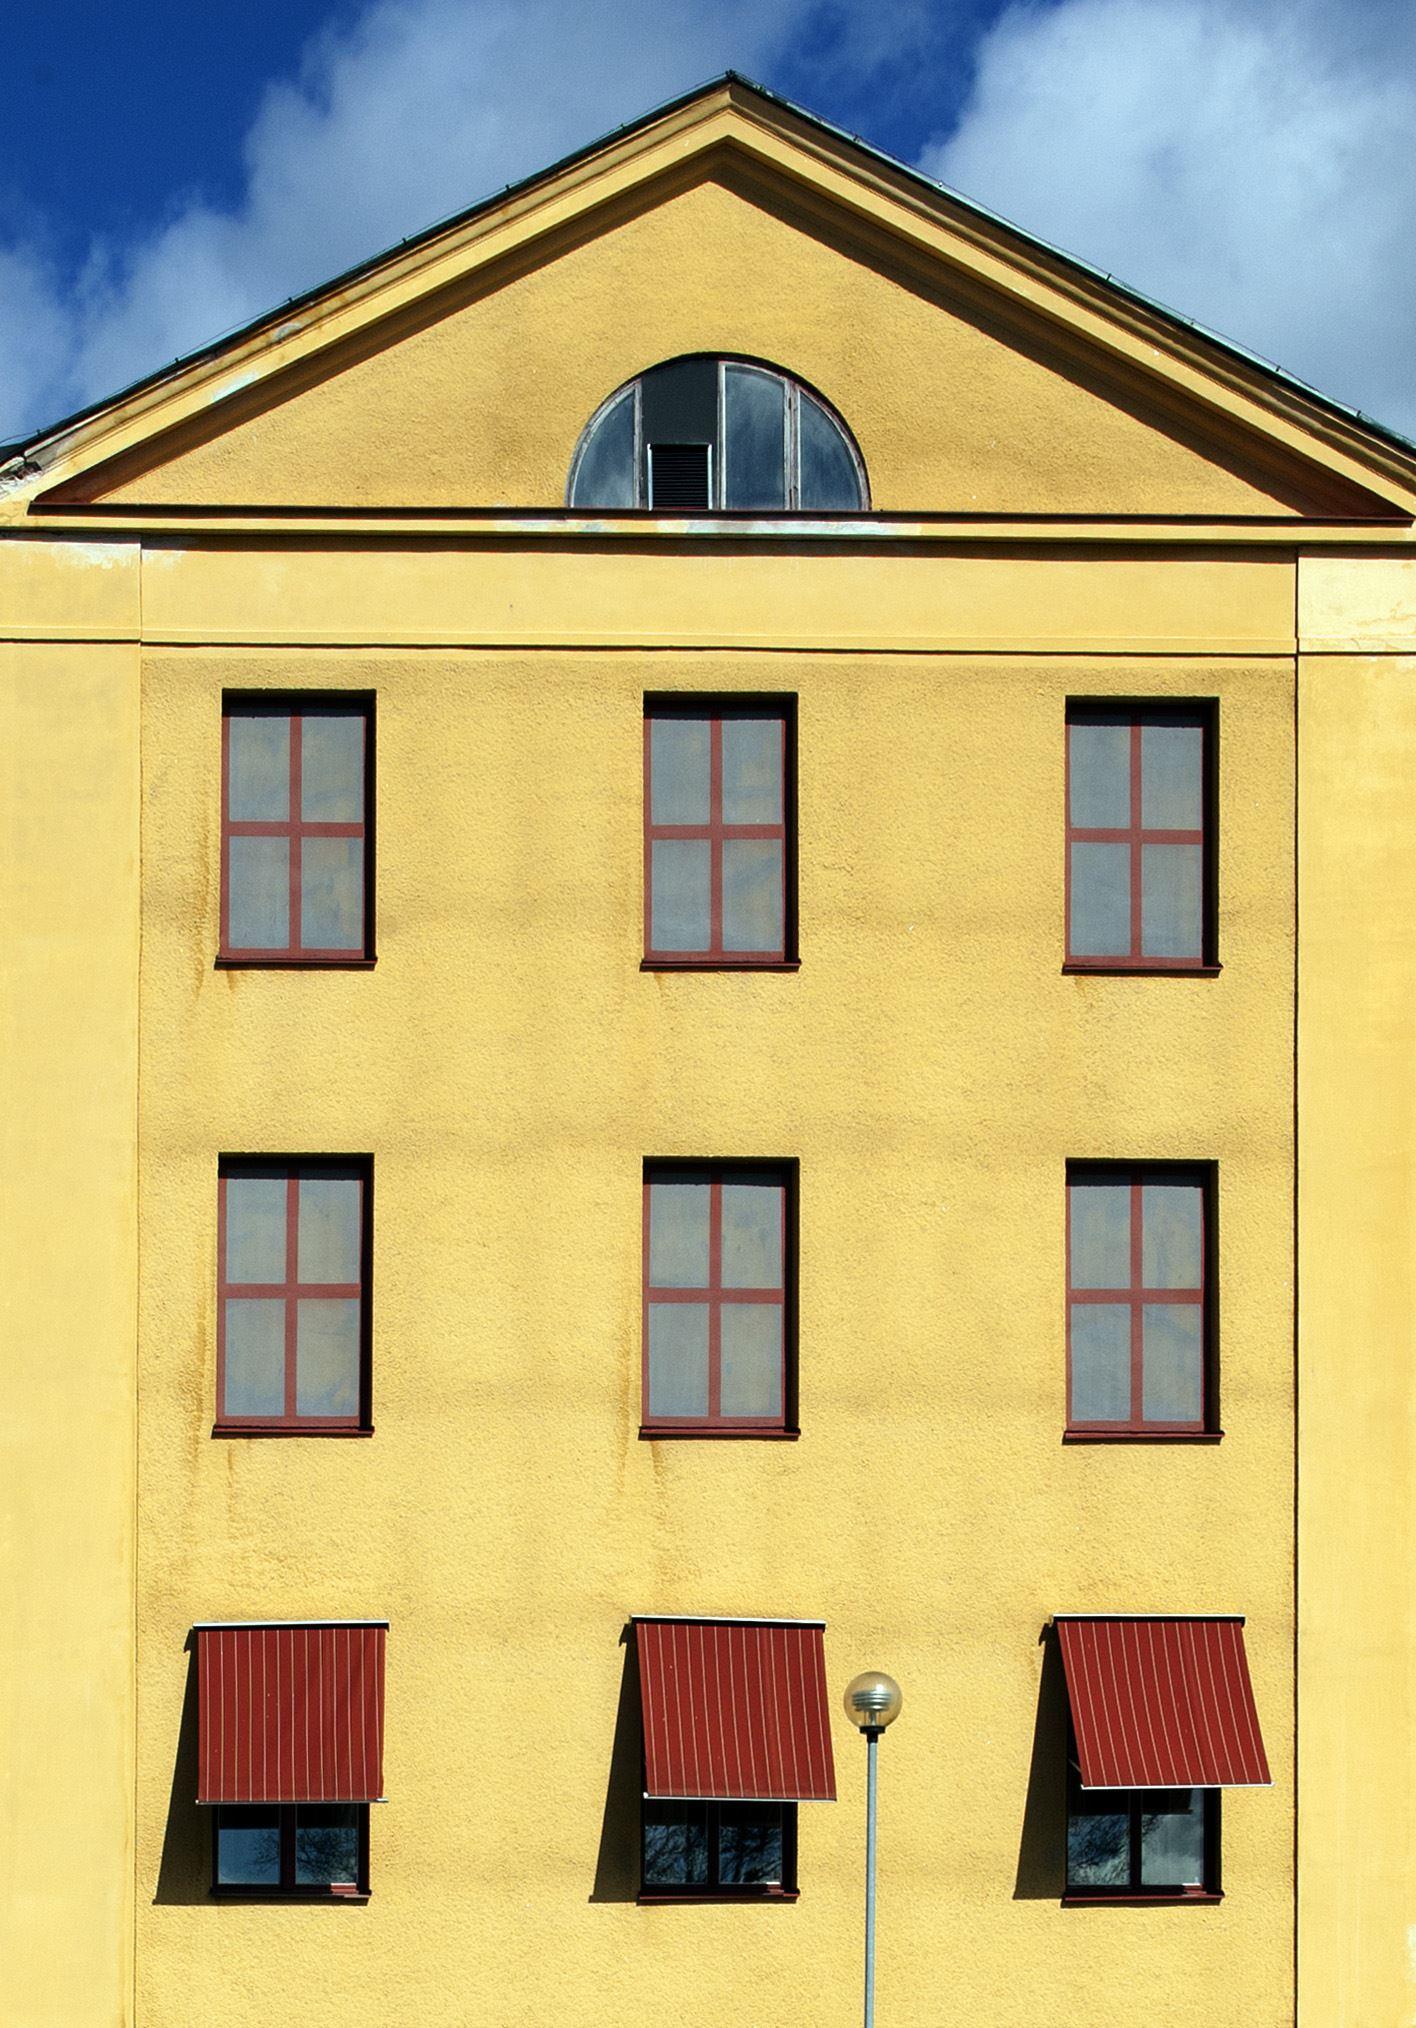 Rolf Boström,  © Landsarkivet i Härnösand, Rolf Boström, Landsarkivet i Härnösand Rosenbäcksallén